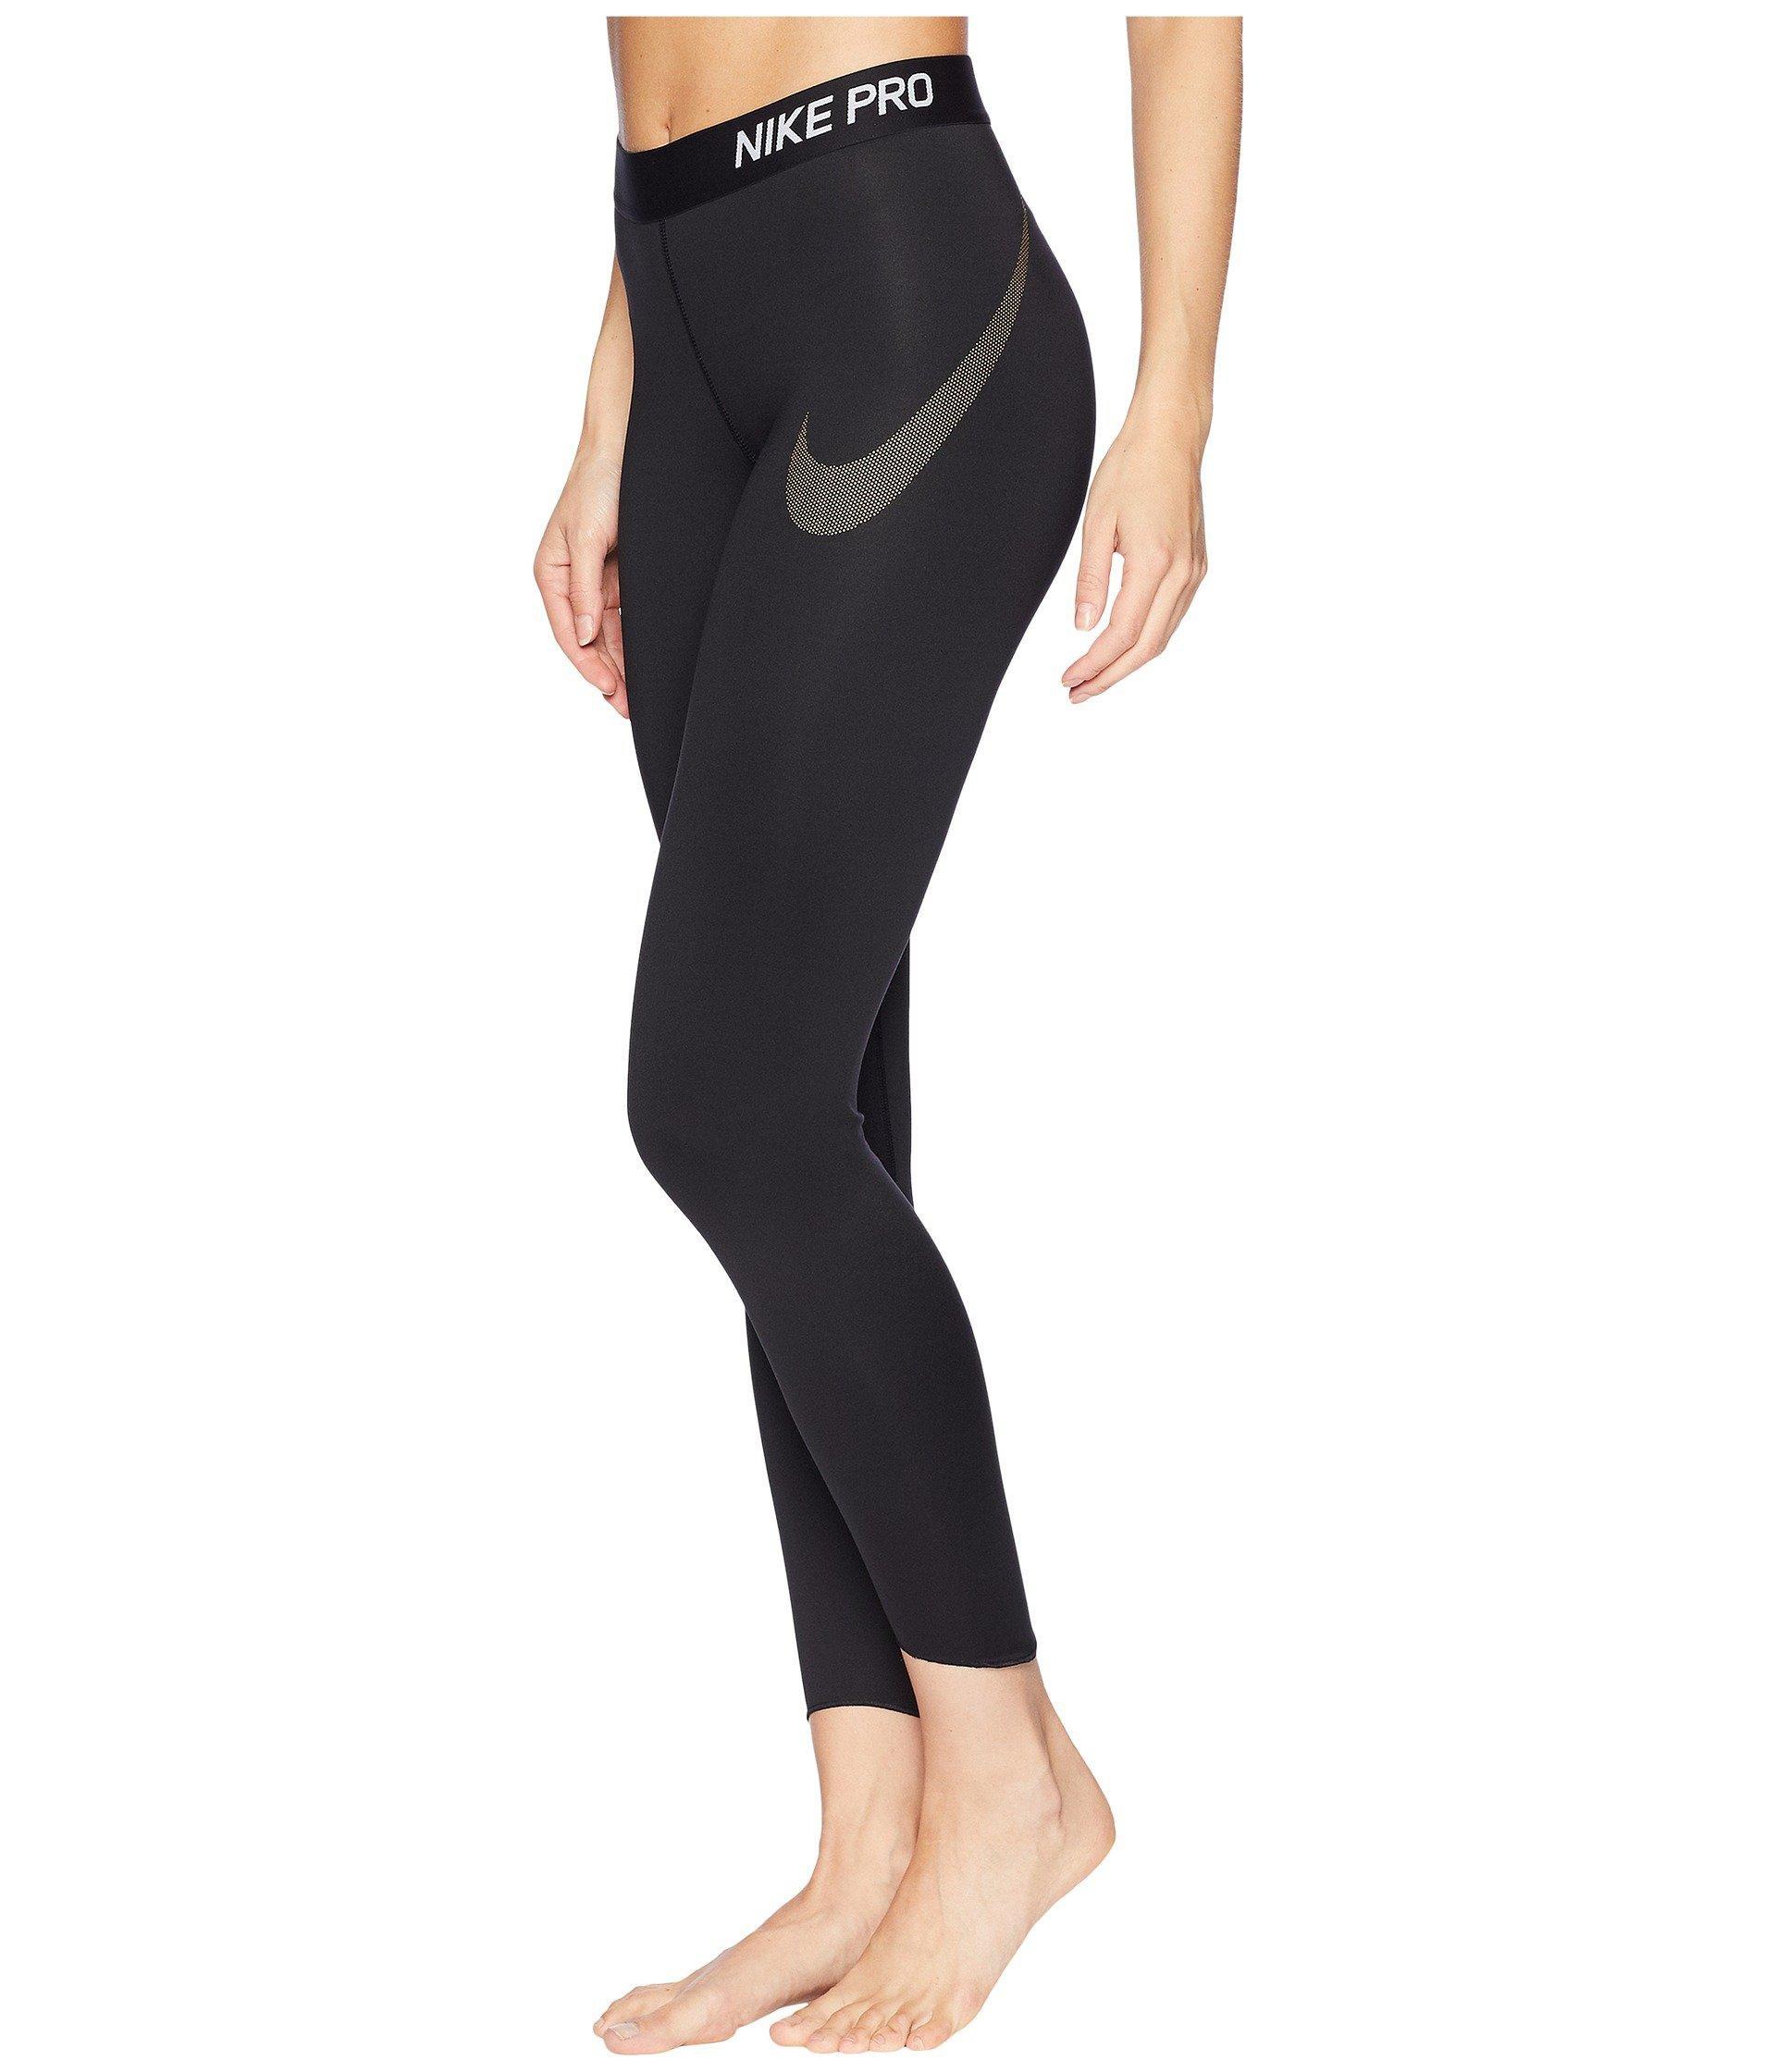 7a24b11ecf5927 Nike Pro Metallic Graphic 7/8 Crop Tights in Black - Lyst